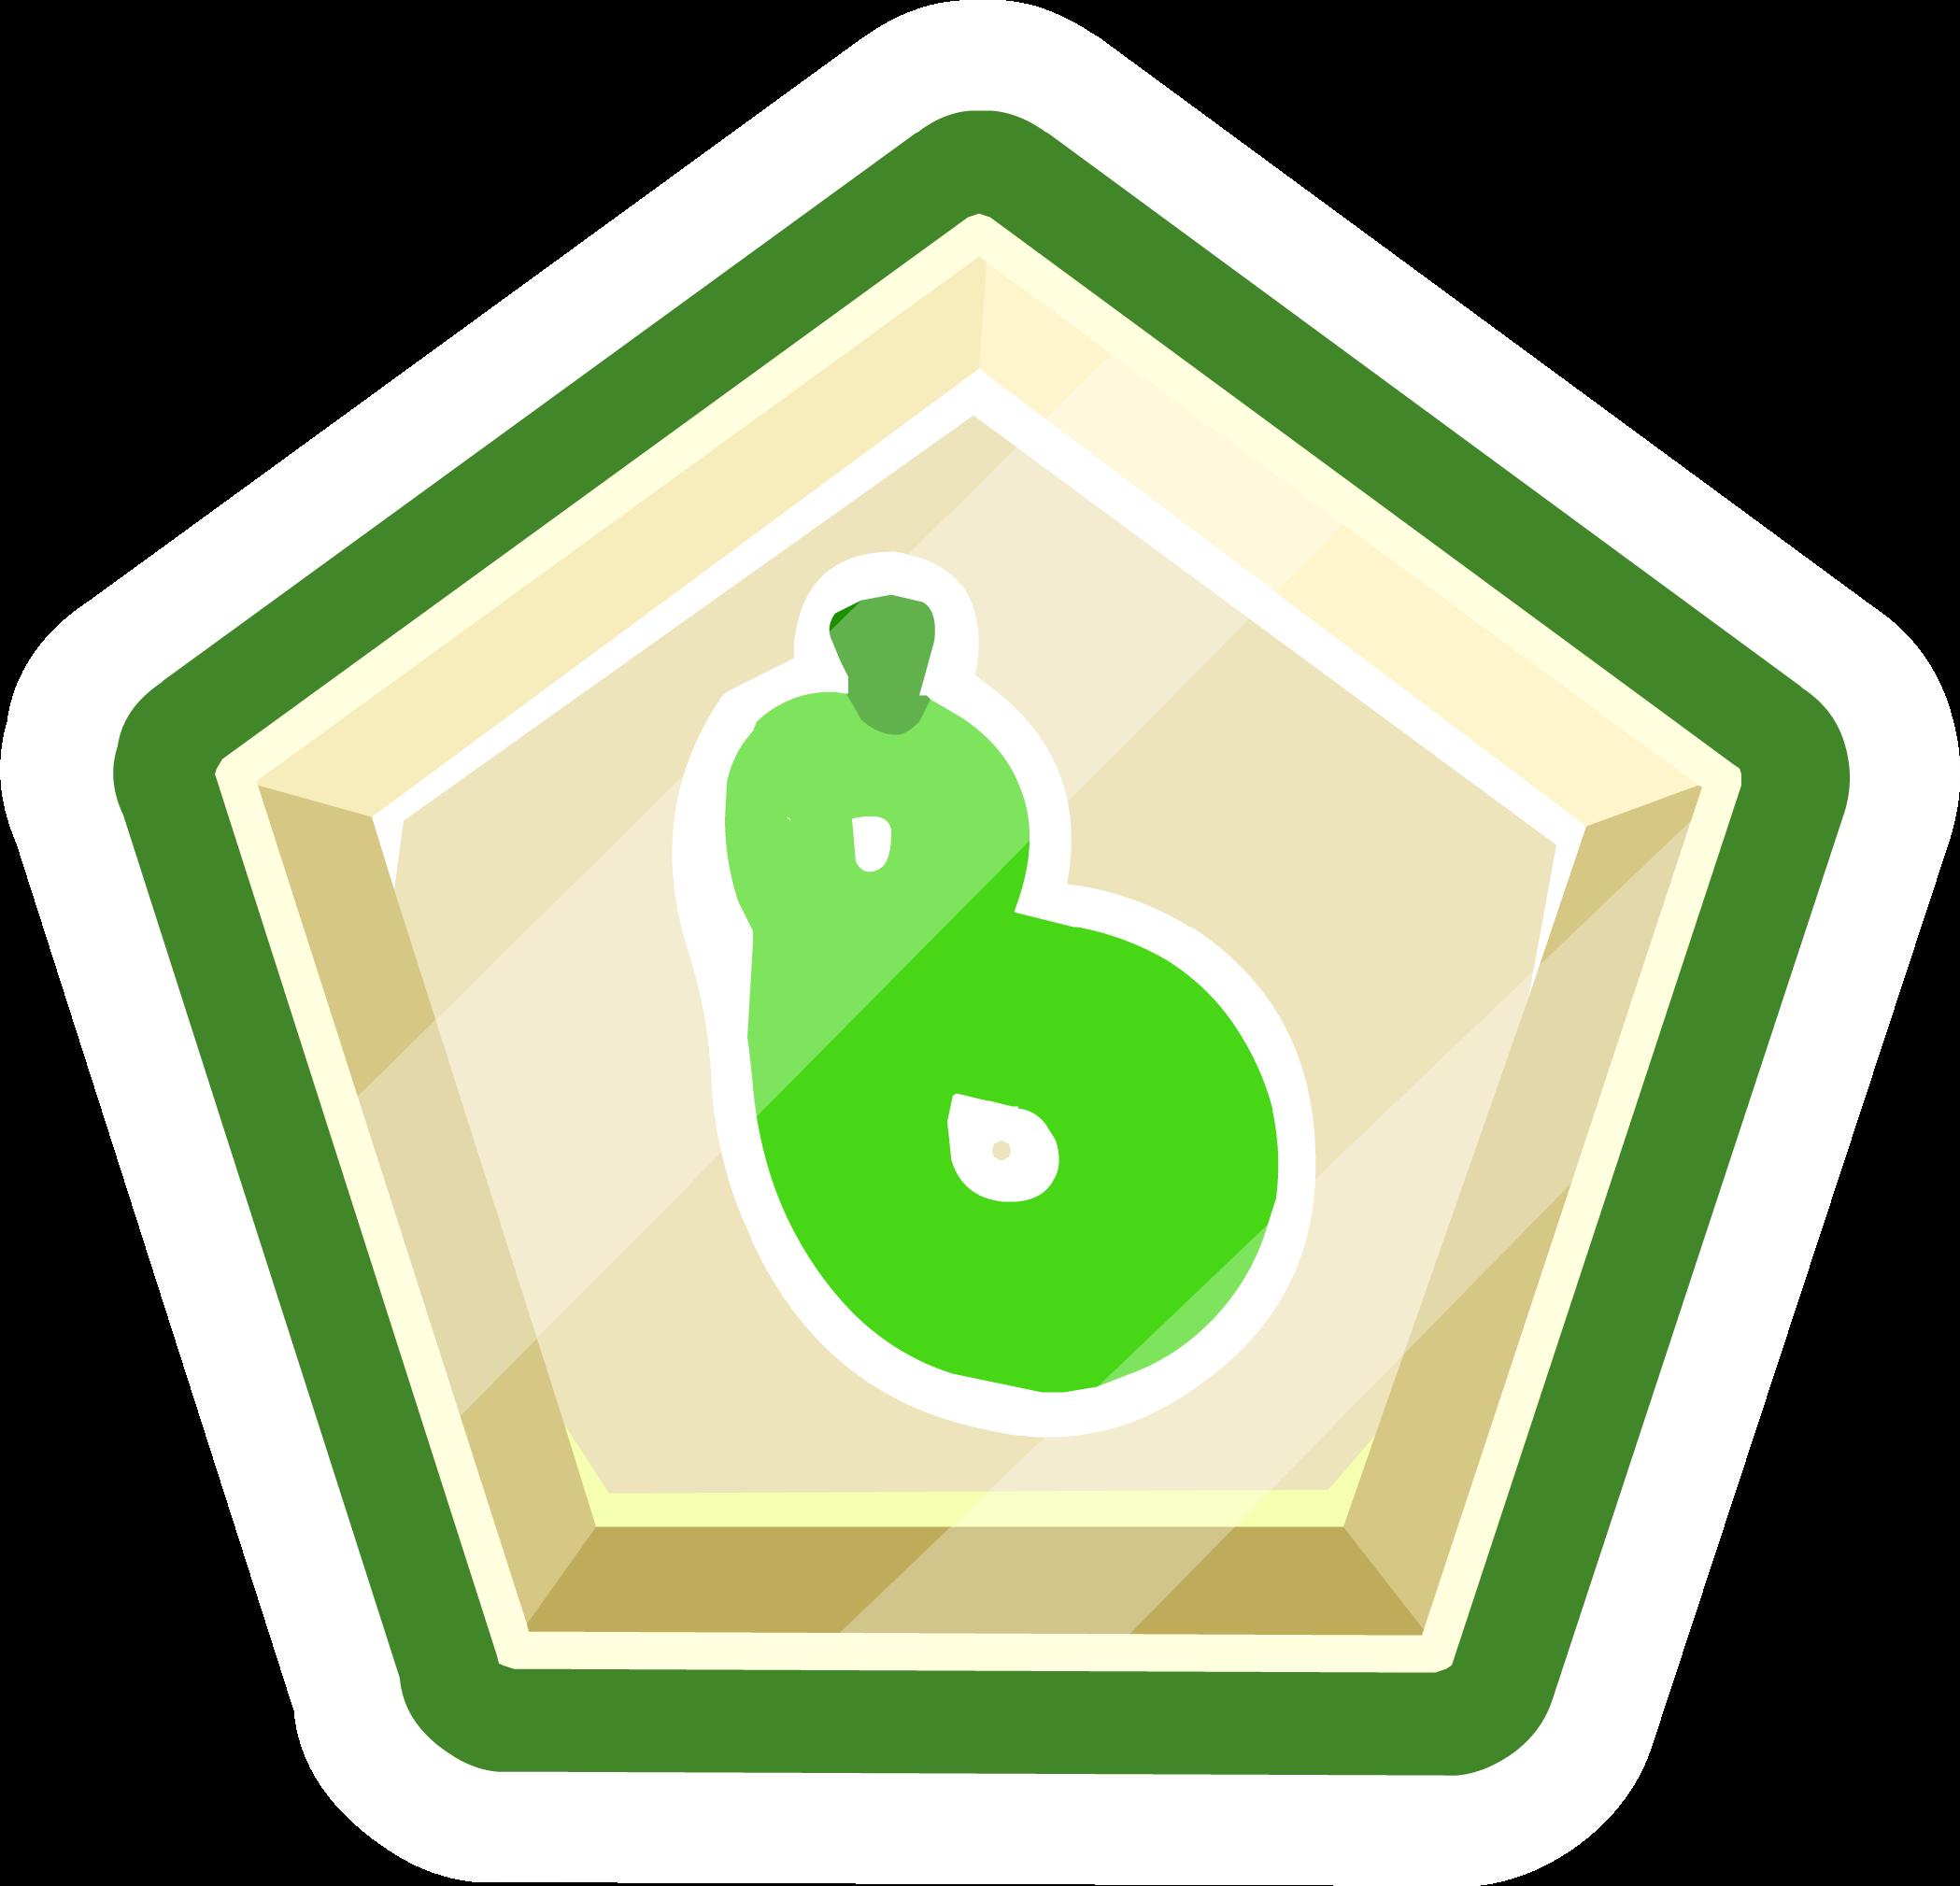 Pin de Puffito Verde